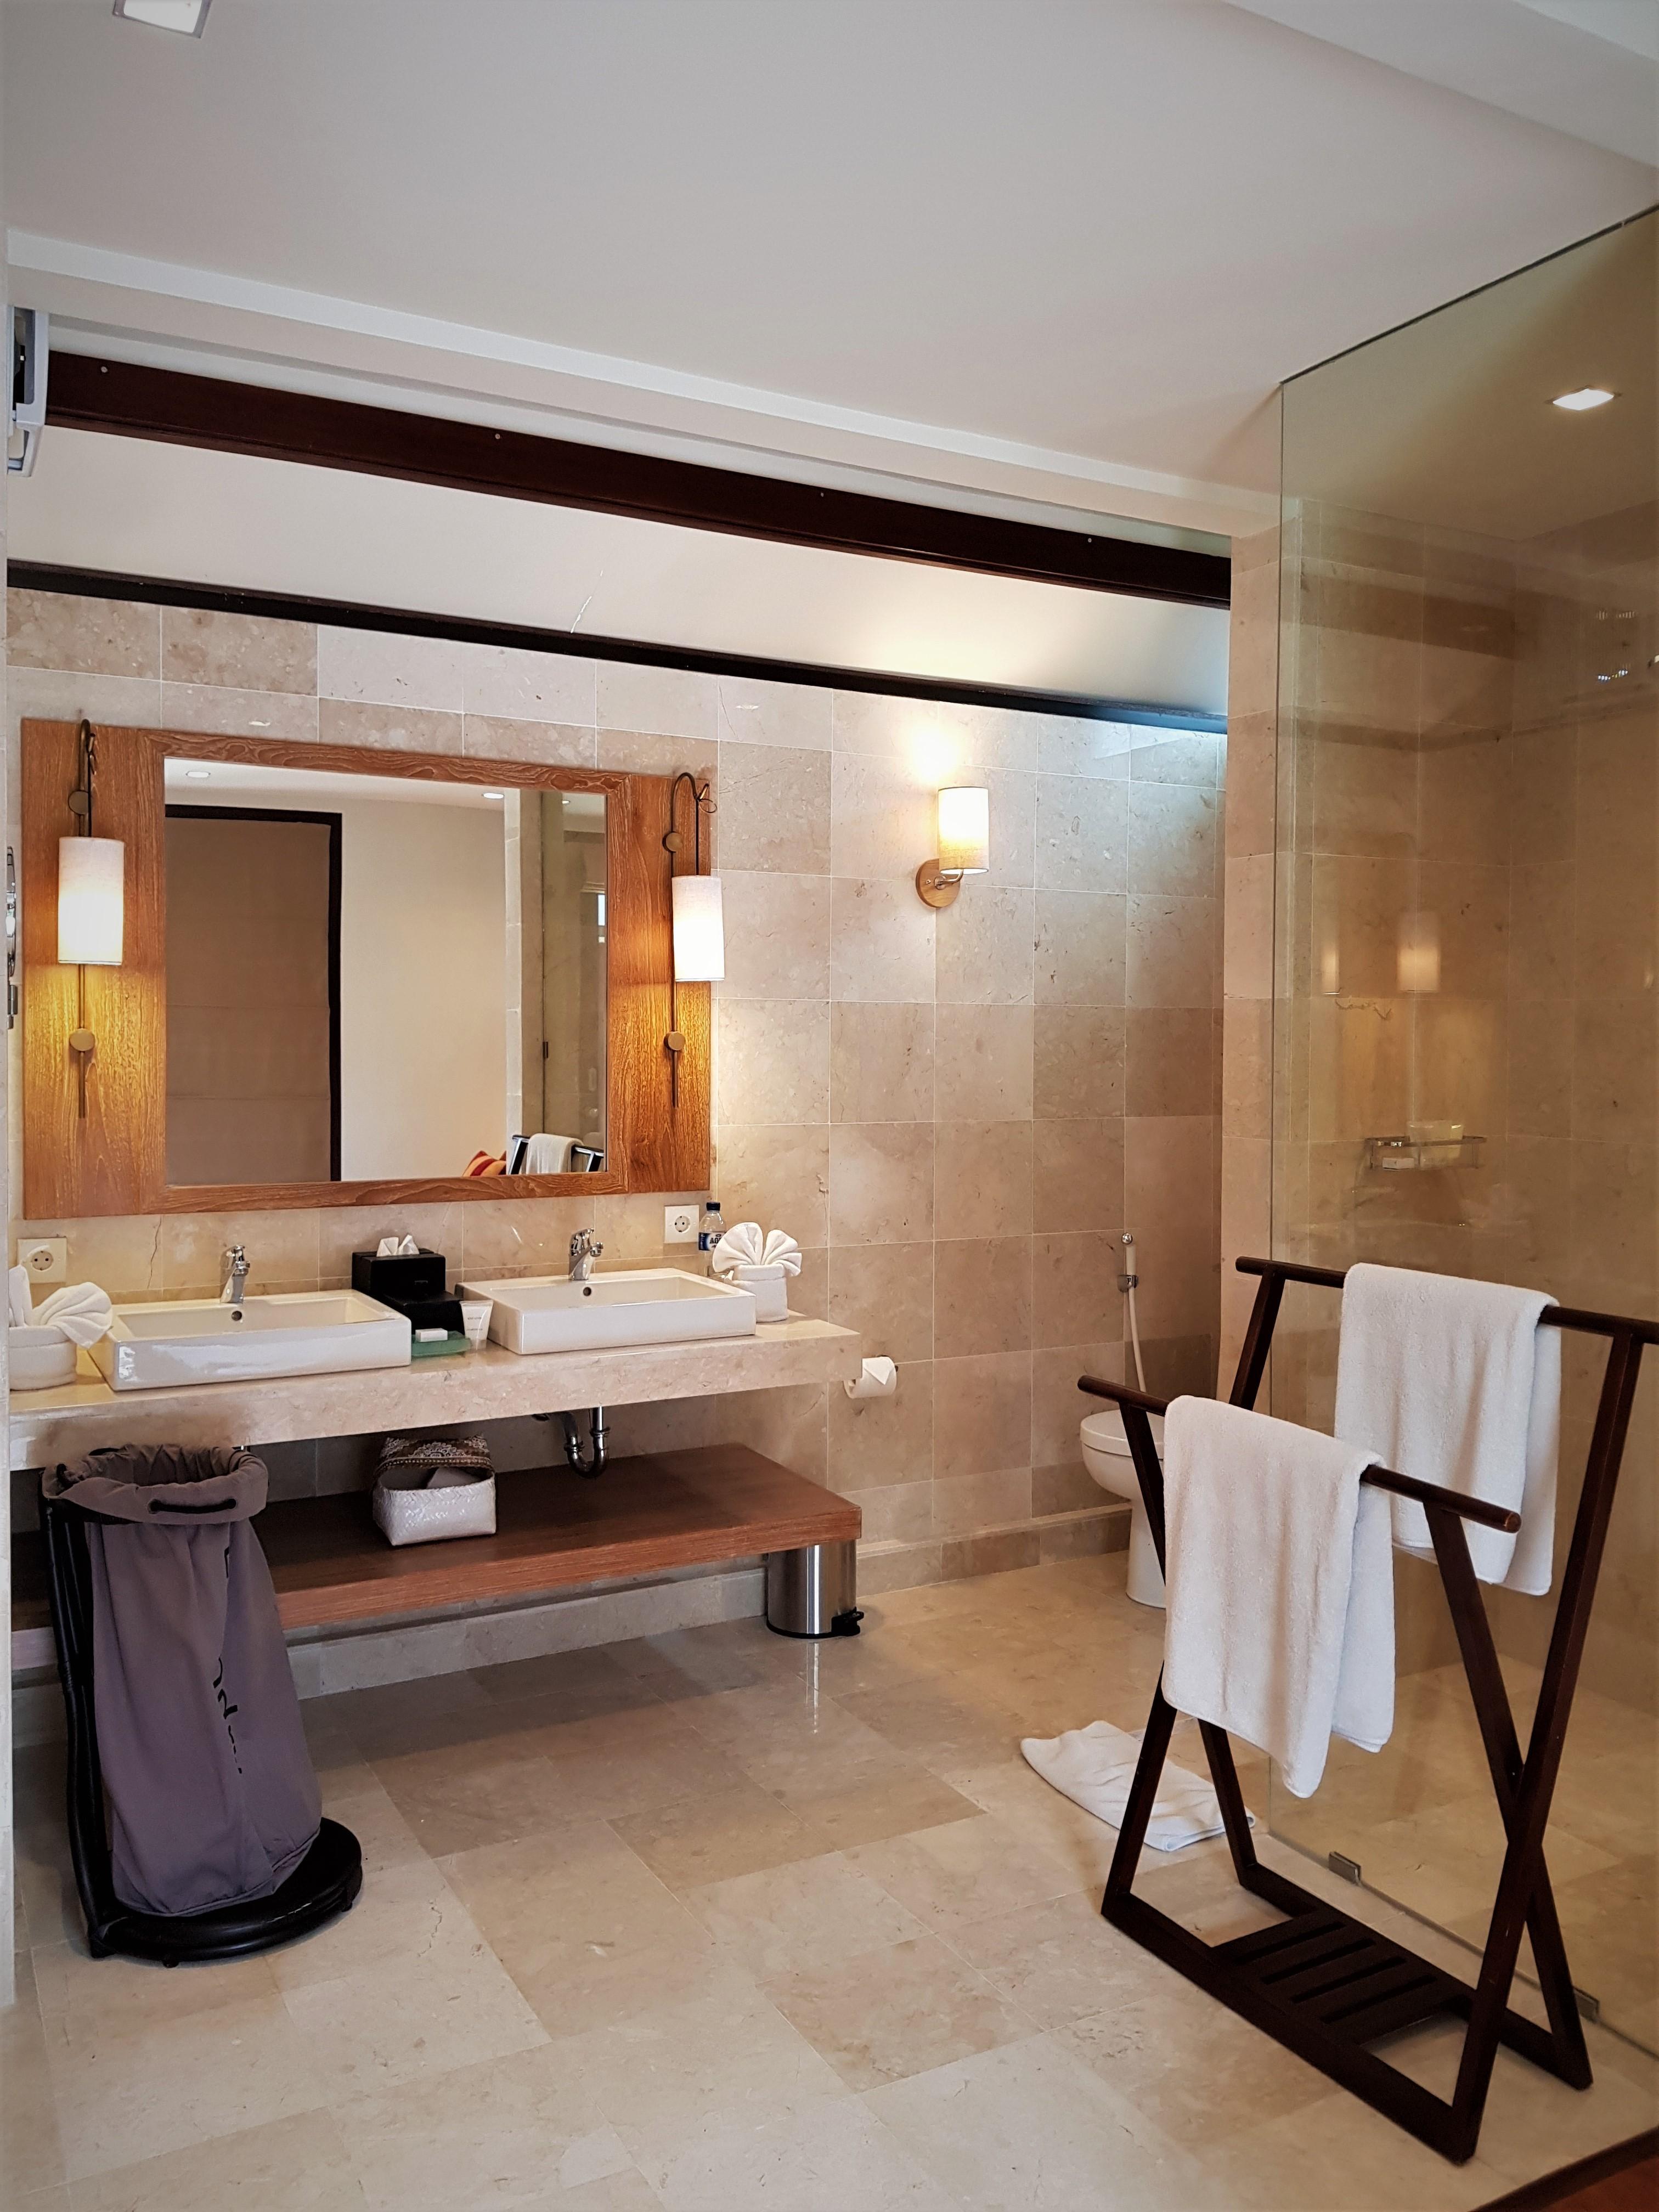 Bathroom-Studio room